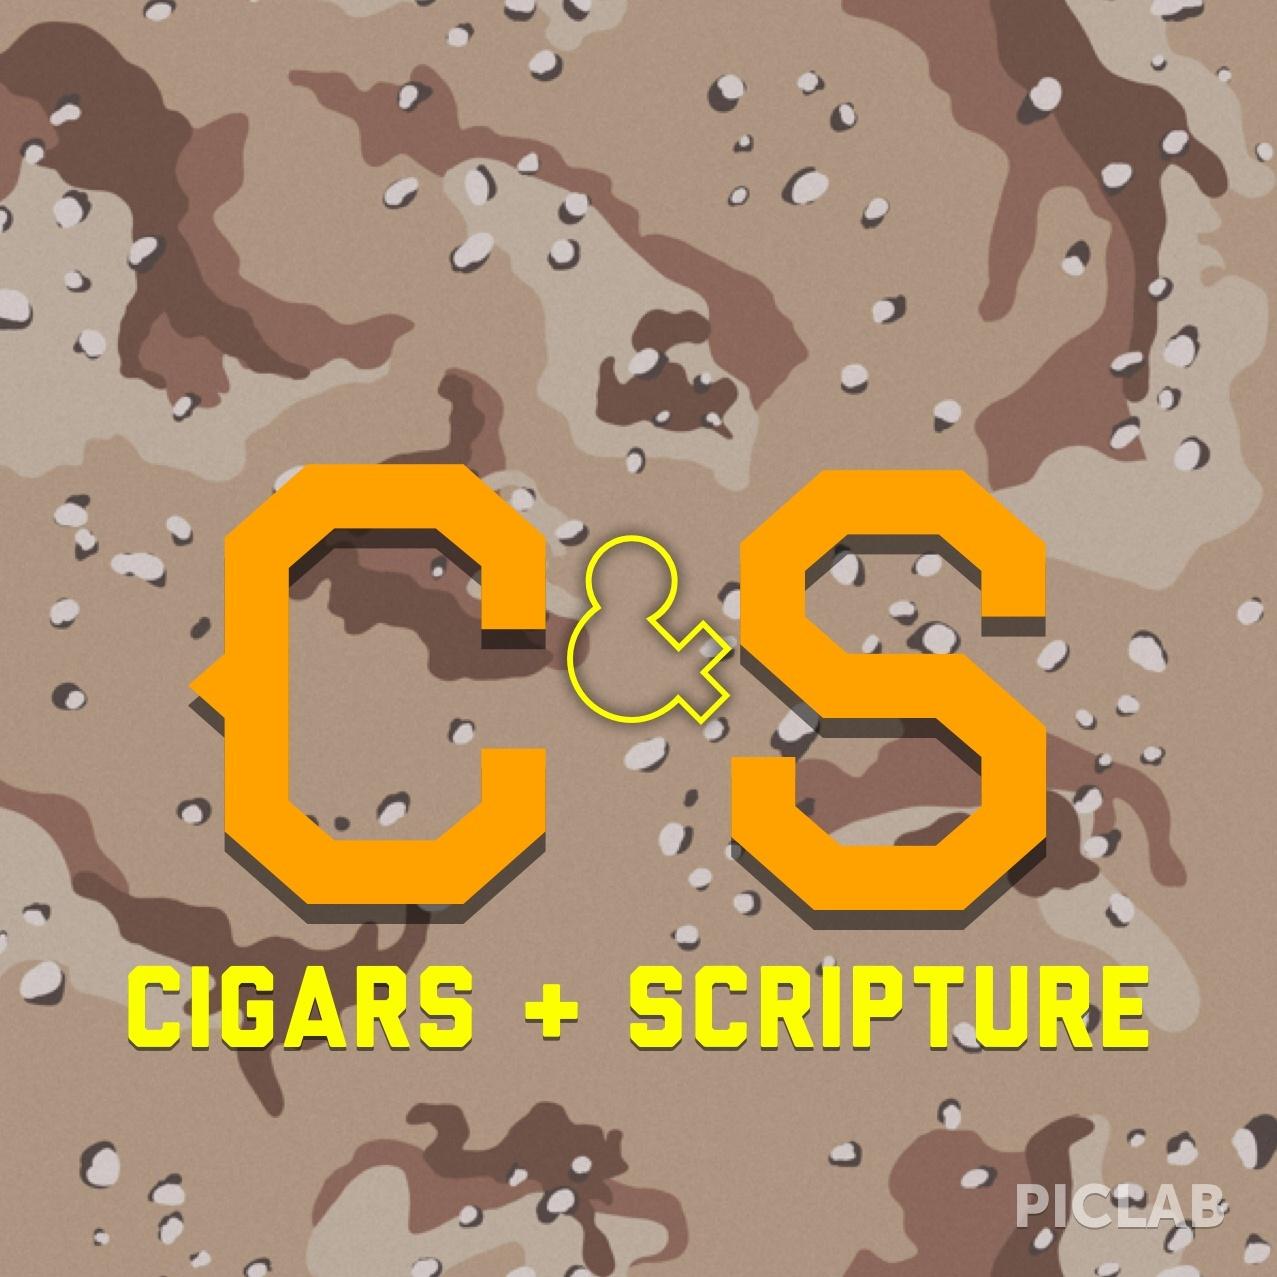 Cigars & Scripture